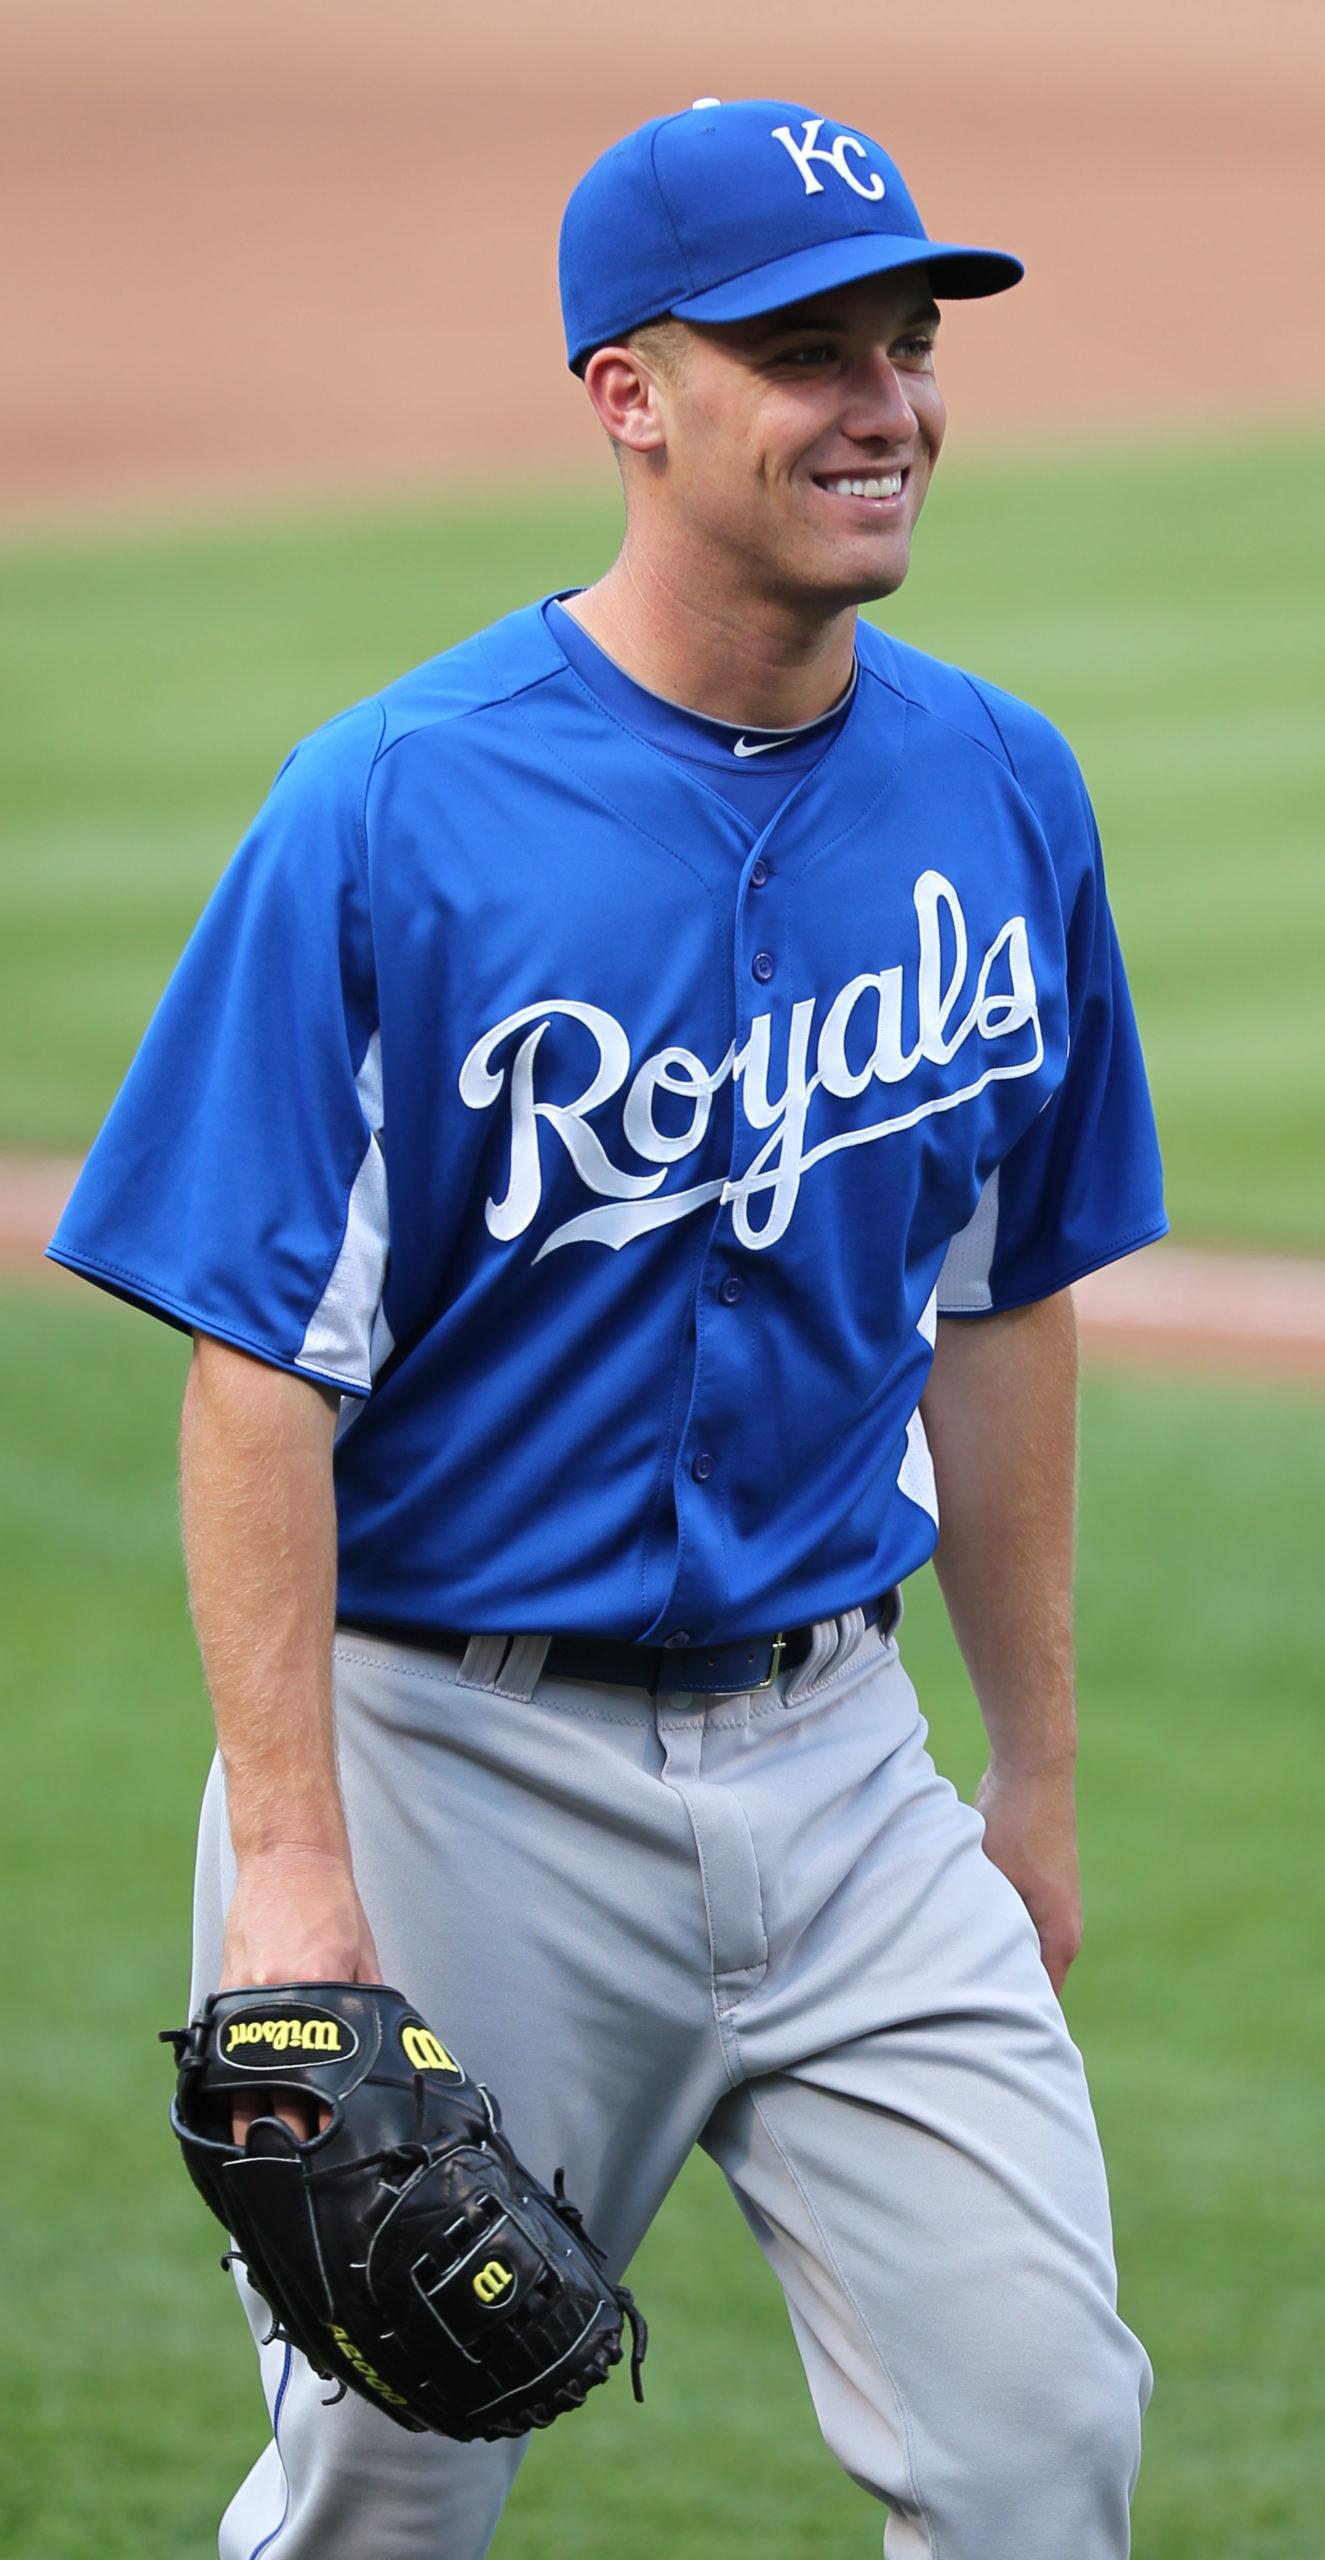 MLB Predictions on Where the Kansas City Royals Will Finish the 2021 Season